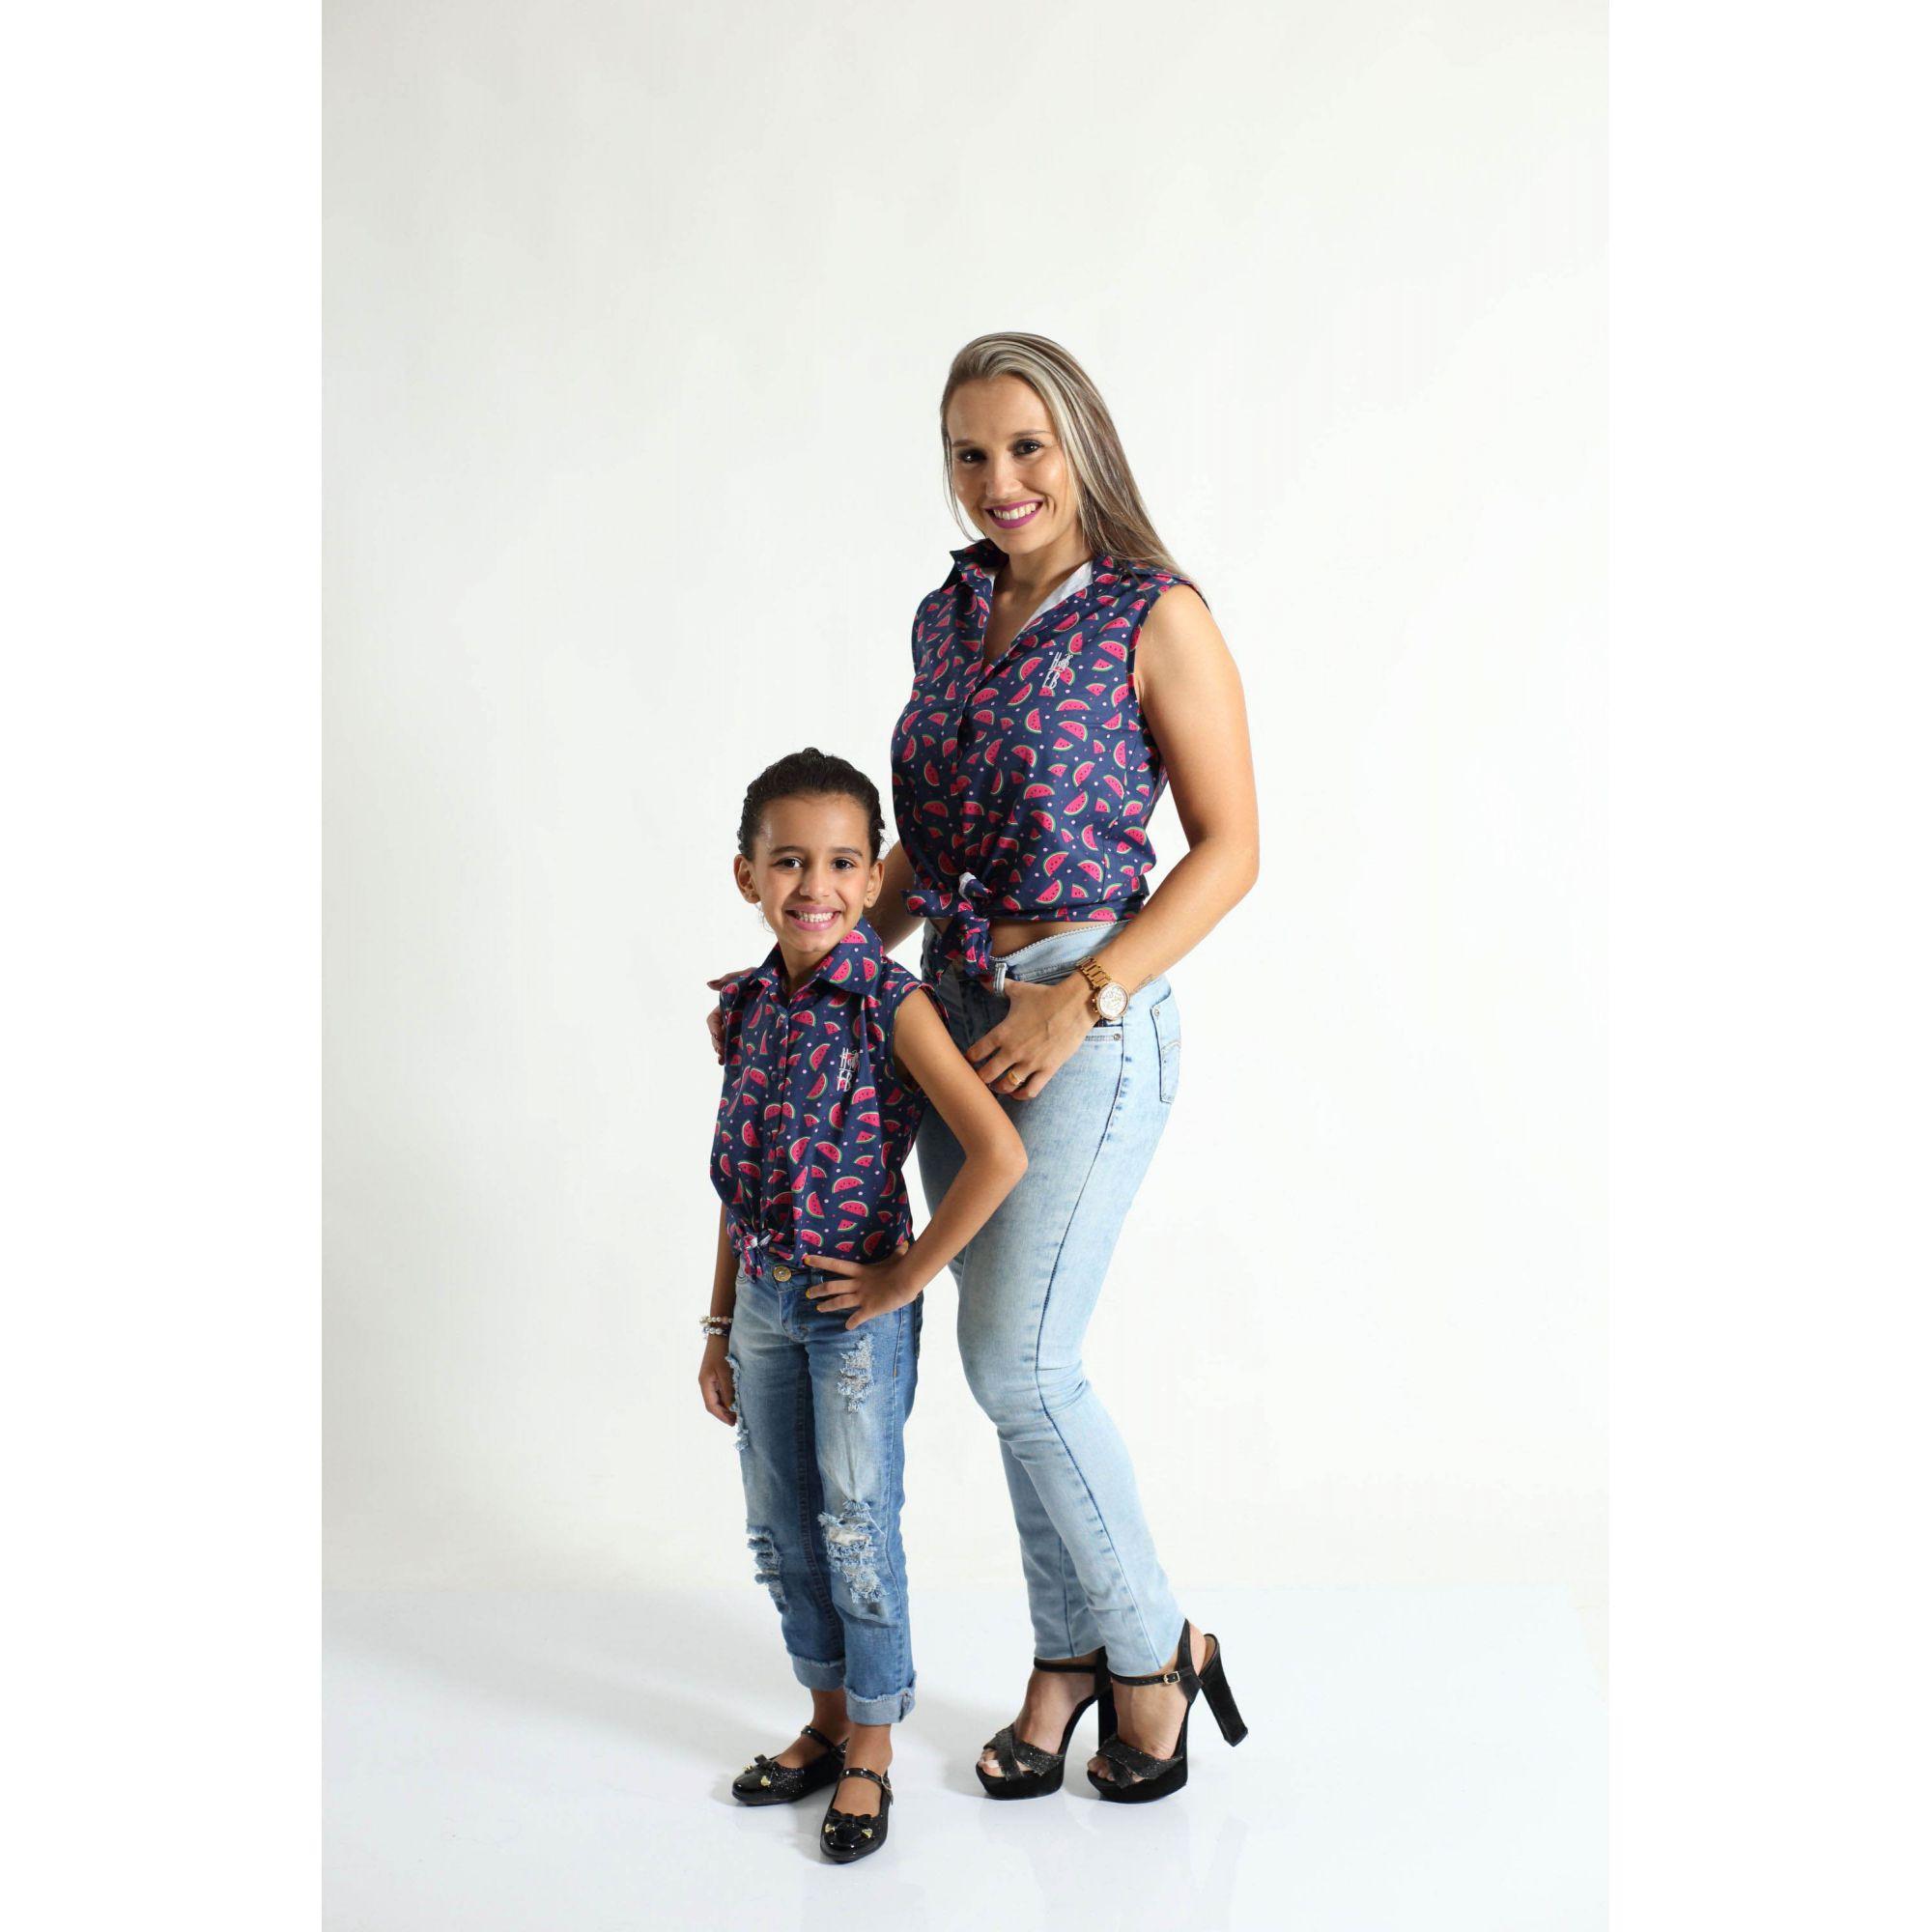 MÃE E FILHA > Kit 02 Camisas Social Adulto e Infantil Melancia [Coleção Tal Mãe Tal Filha]